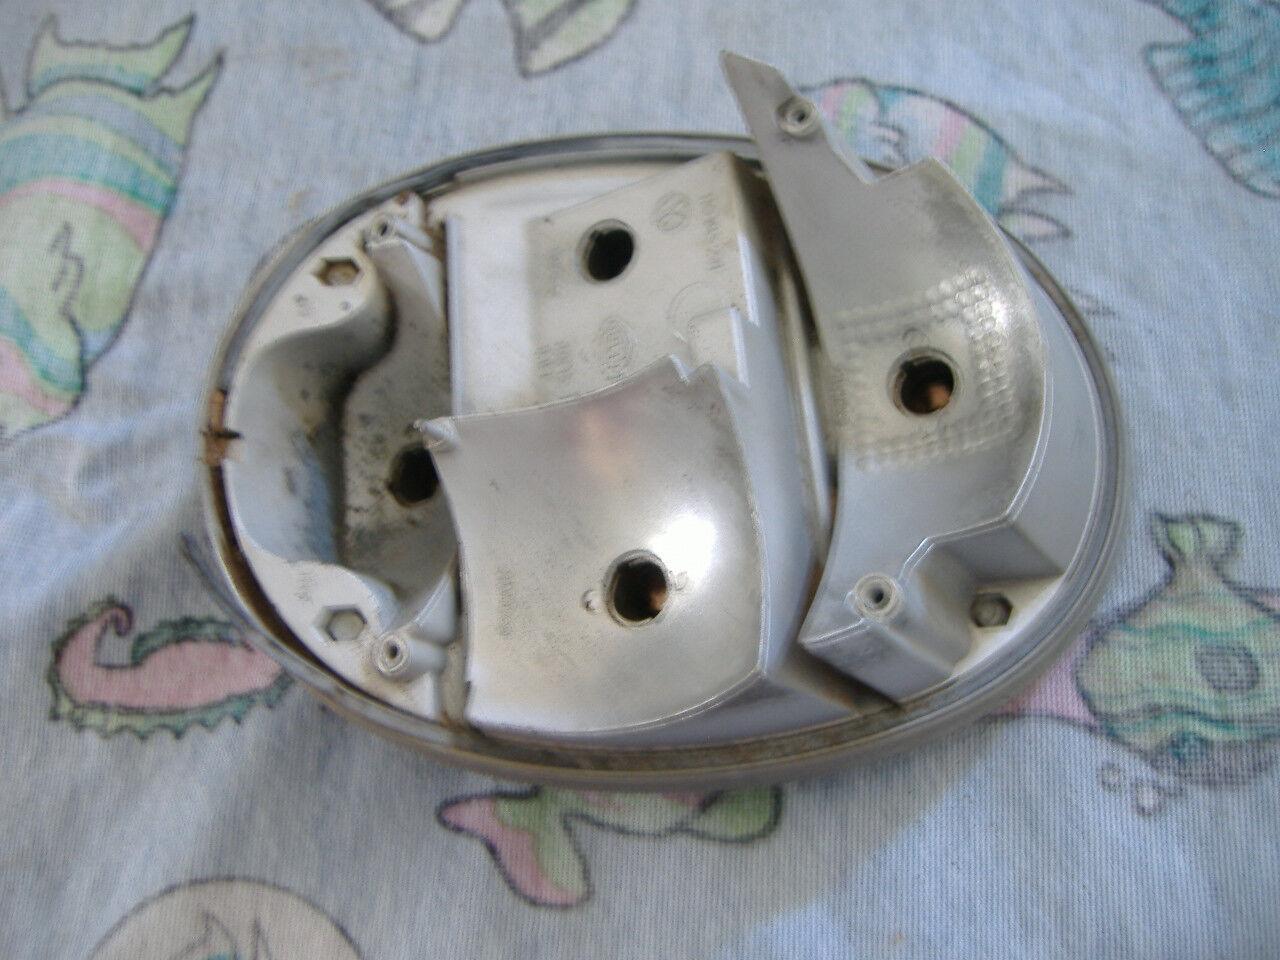 VW Vintage Parts Screw Super Beetle /'73 Upper Screws Tail Light Lens /' 79